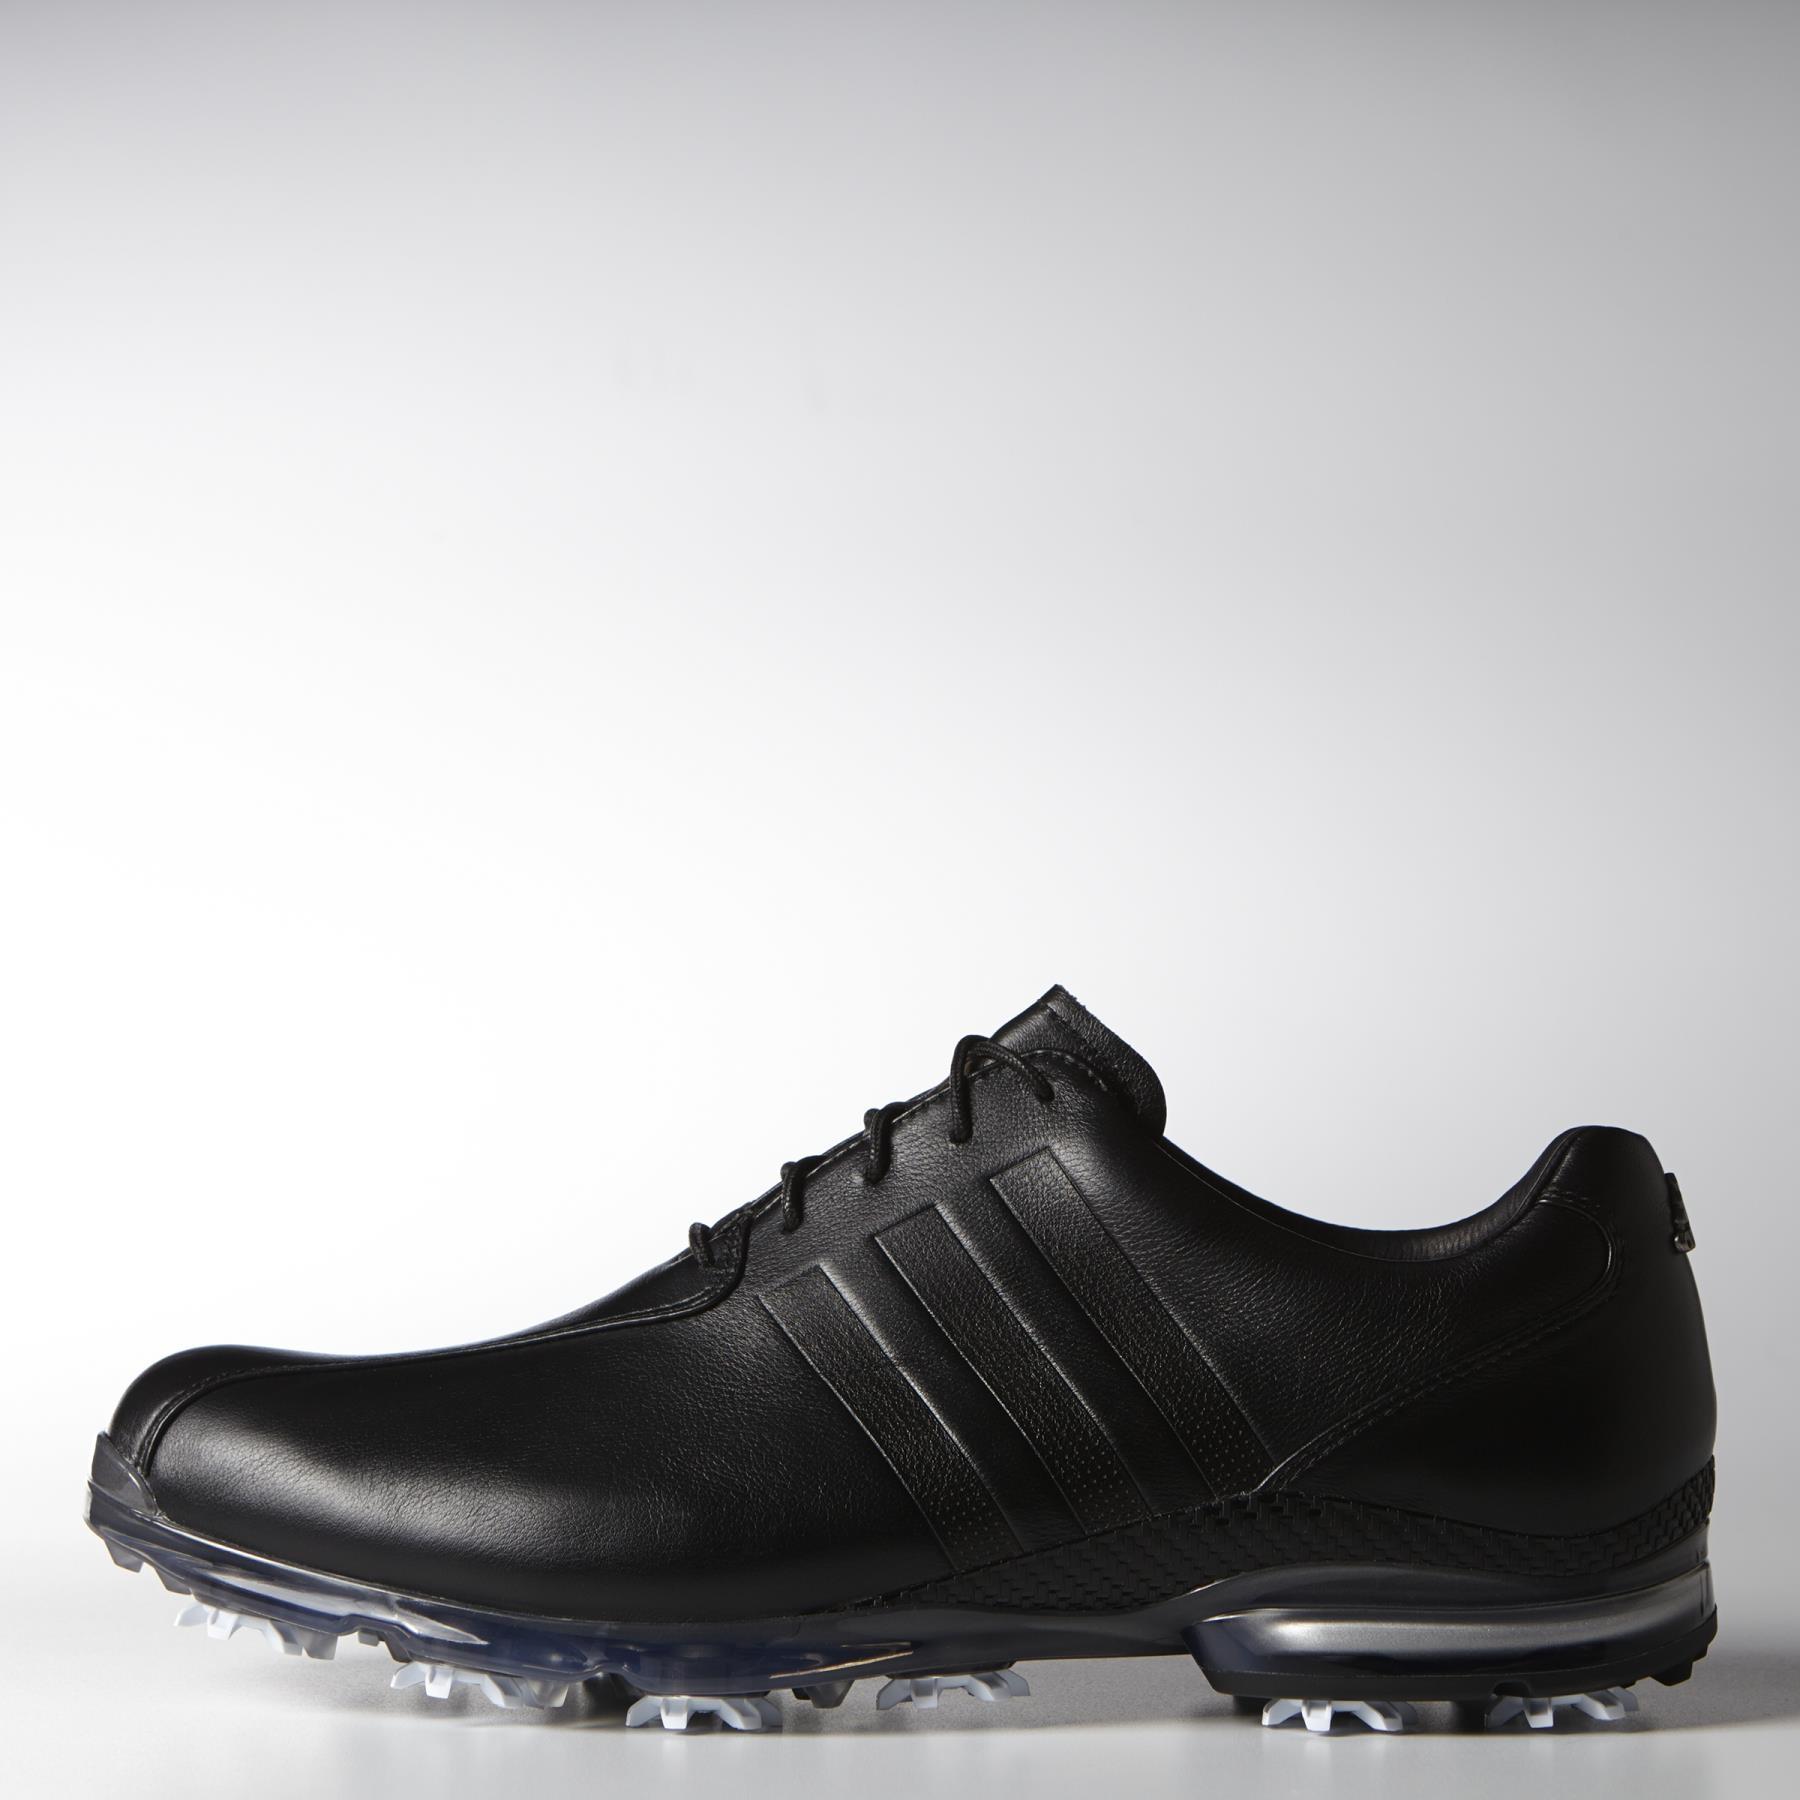 adidas shoes 2016 for men black. adidas-adipure-tp-men-039-s-medium-golf- adidas shoes 2016 for men black